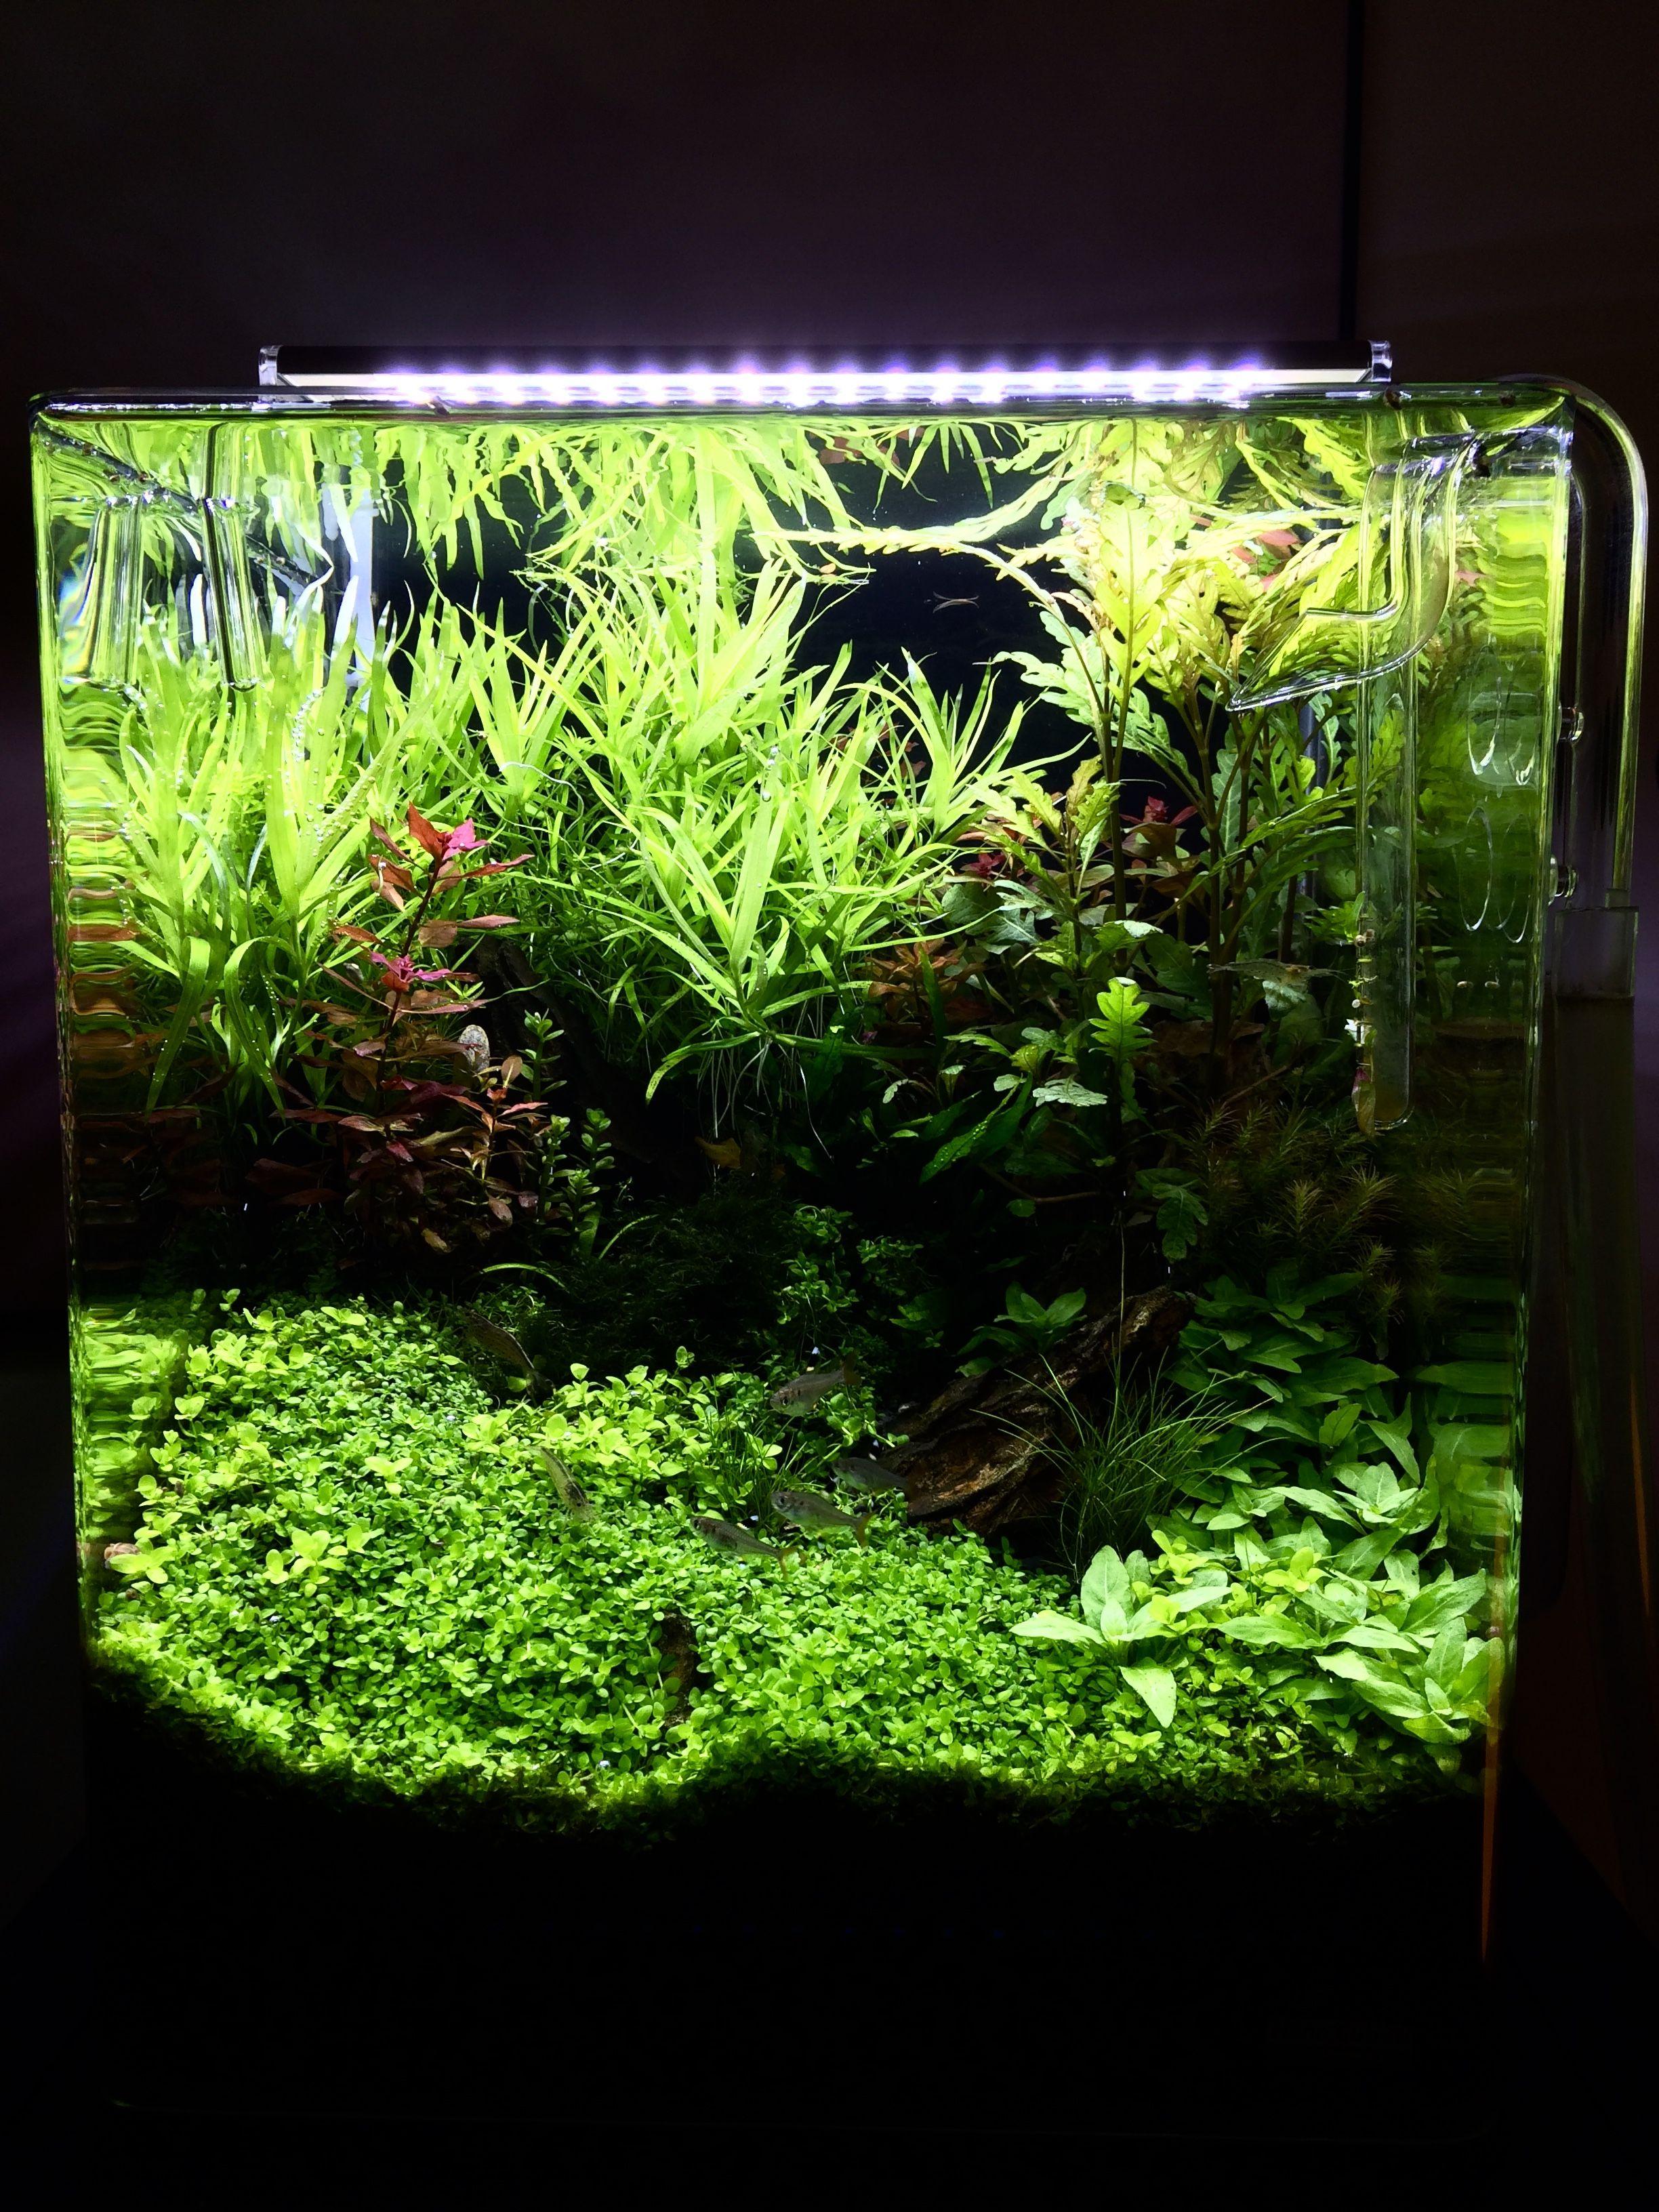 Aquascape 30 Liter ,Marcel engbers | Aquascape, Planted ...